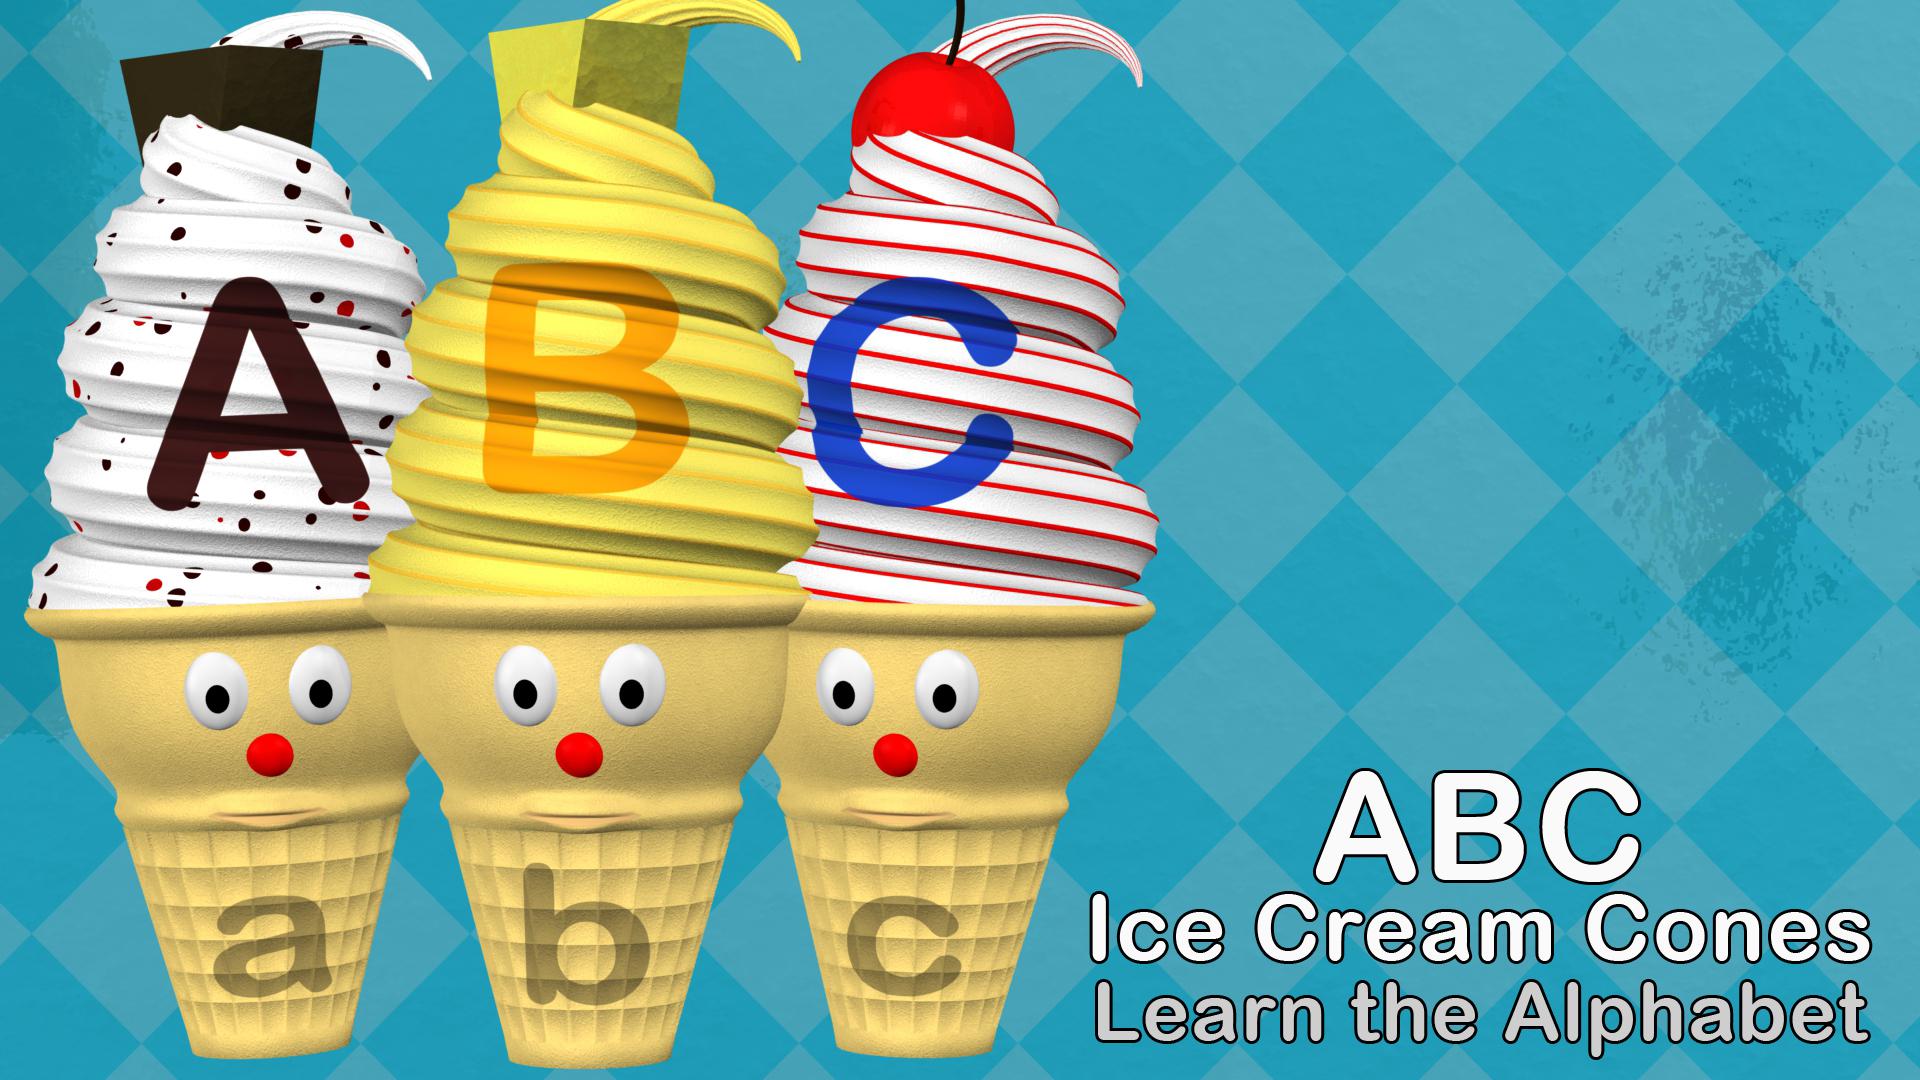 ABC Ice Cream Cones - Learn the Alphabet